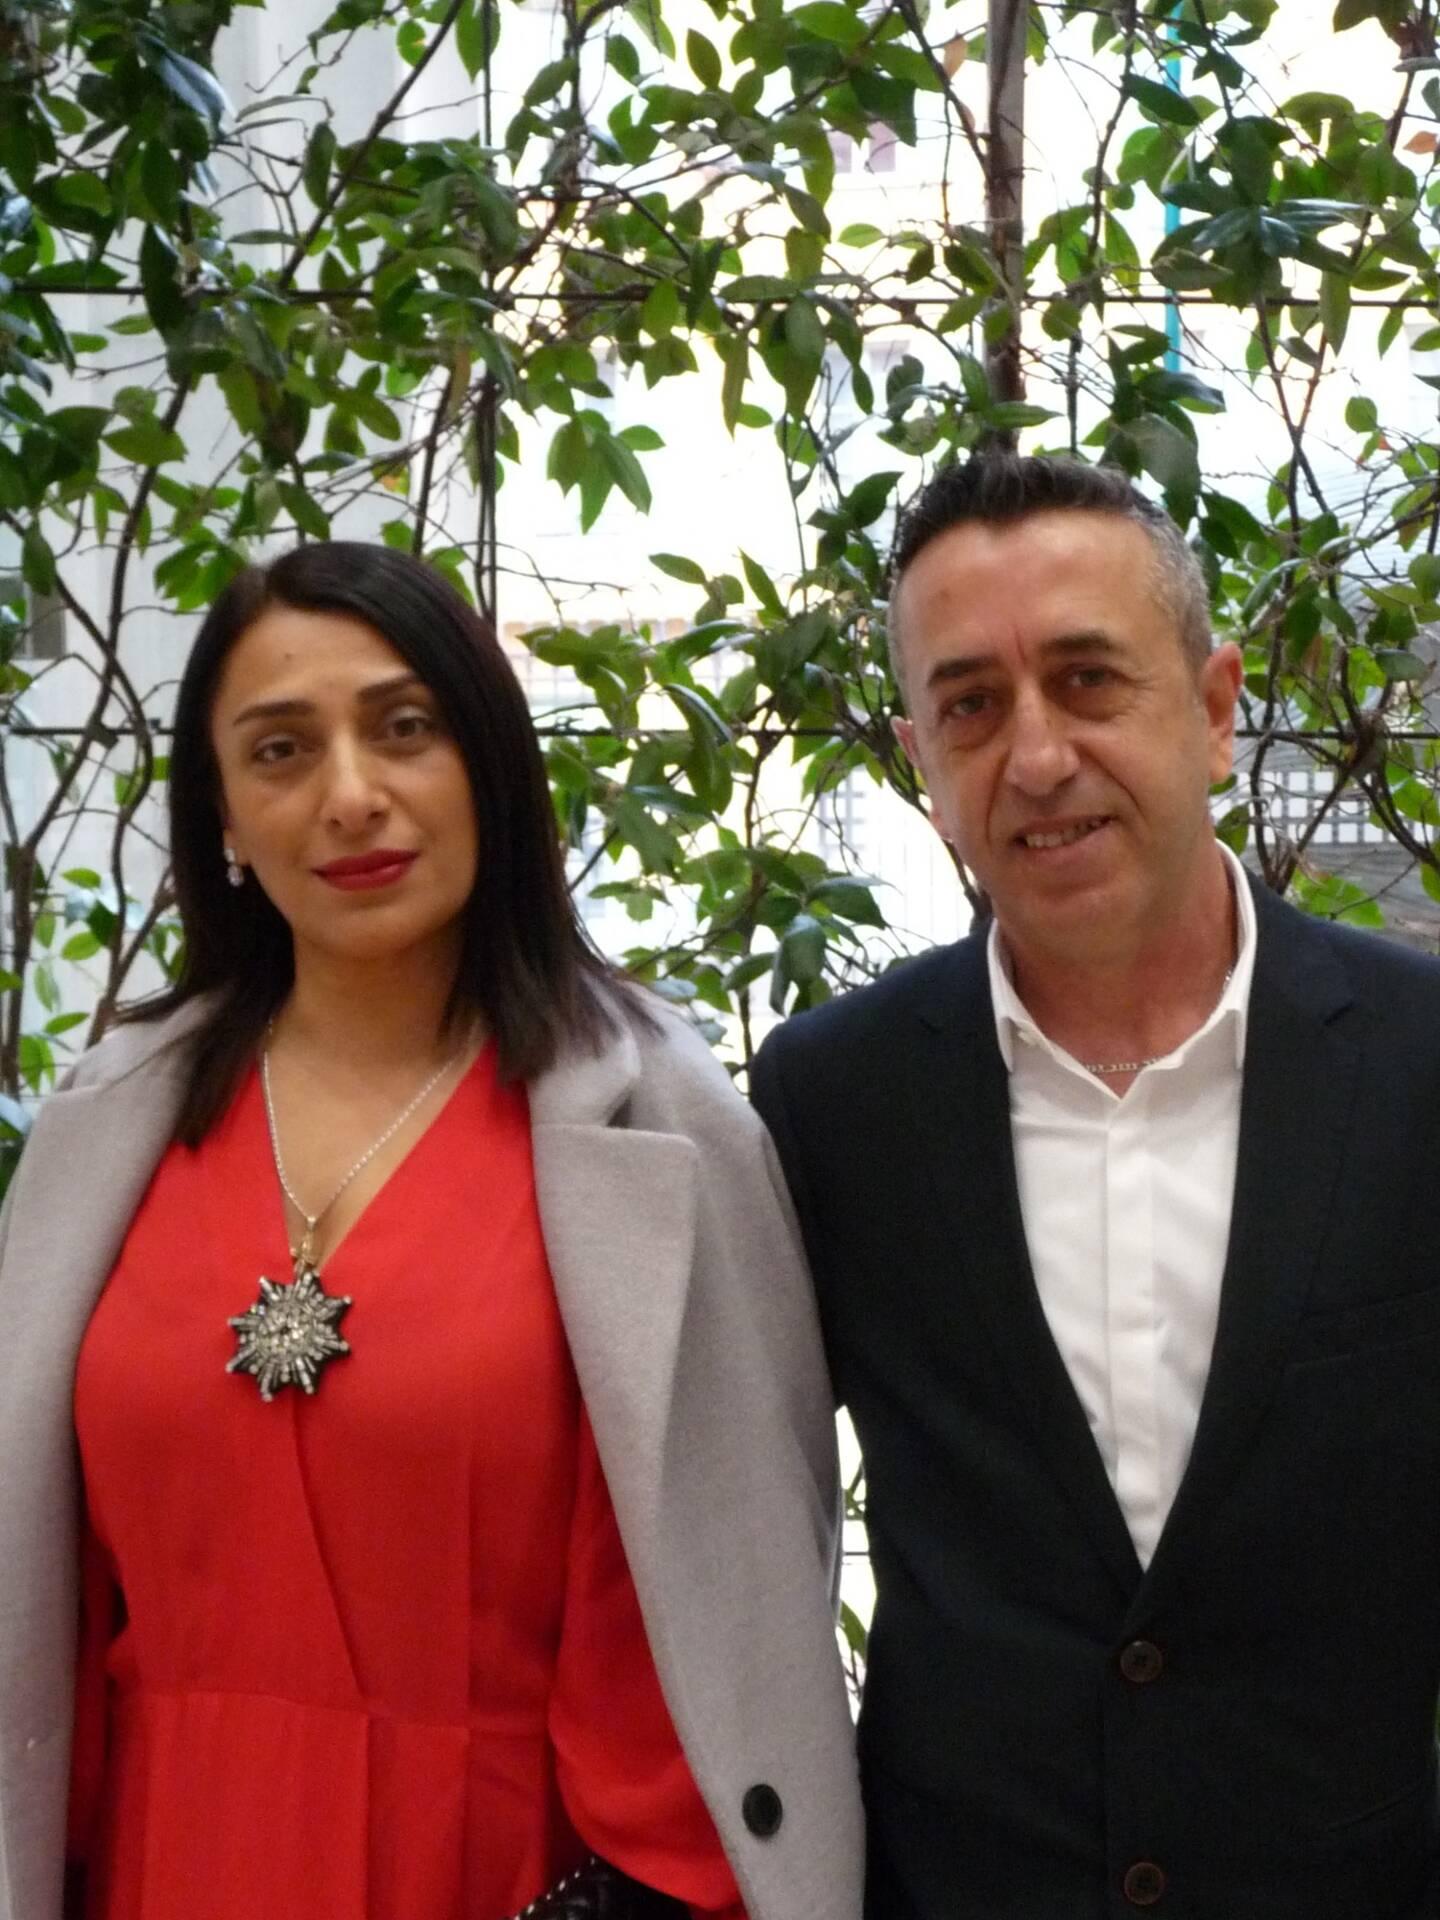 Naisi Bolashvili, sans emploi, et Lucien Sammartano, employé de mairie.